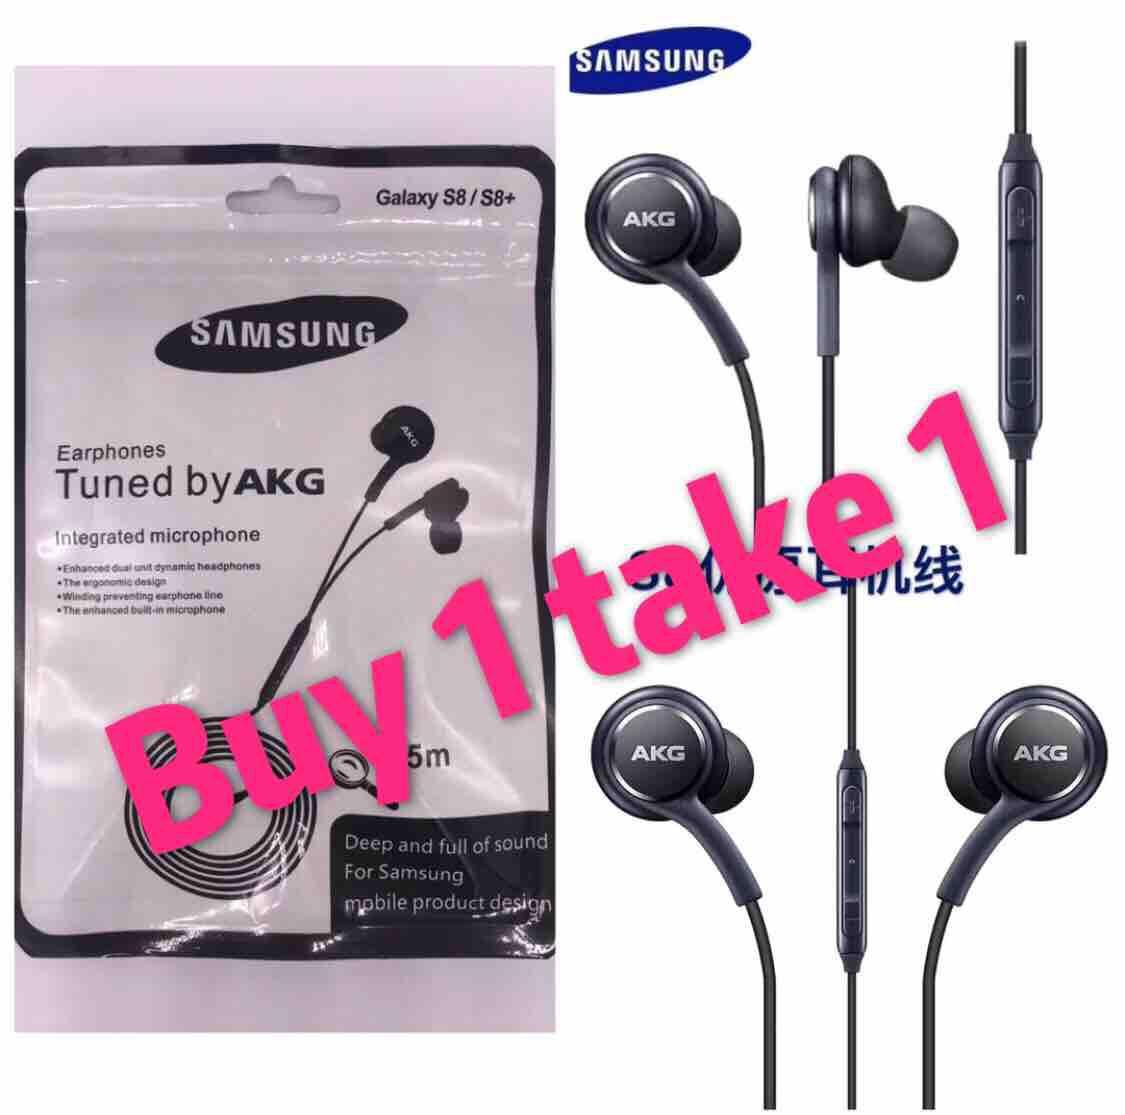 Buy 1 take 1 SamSung S8 AKG Original universal earphone /headset